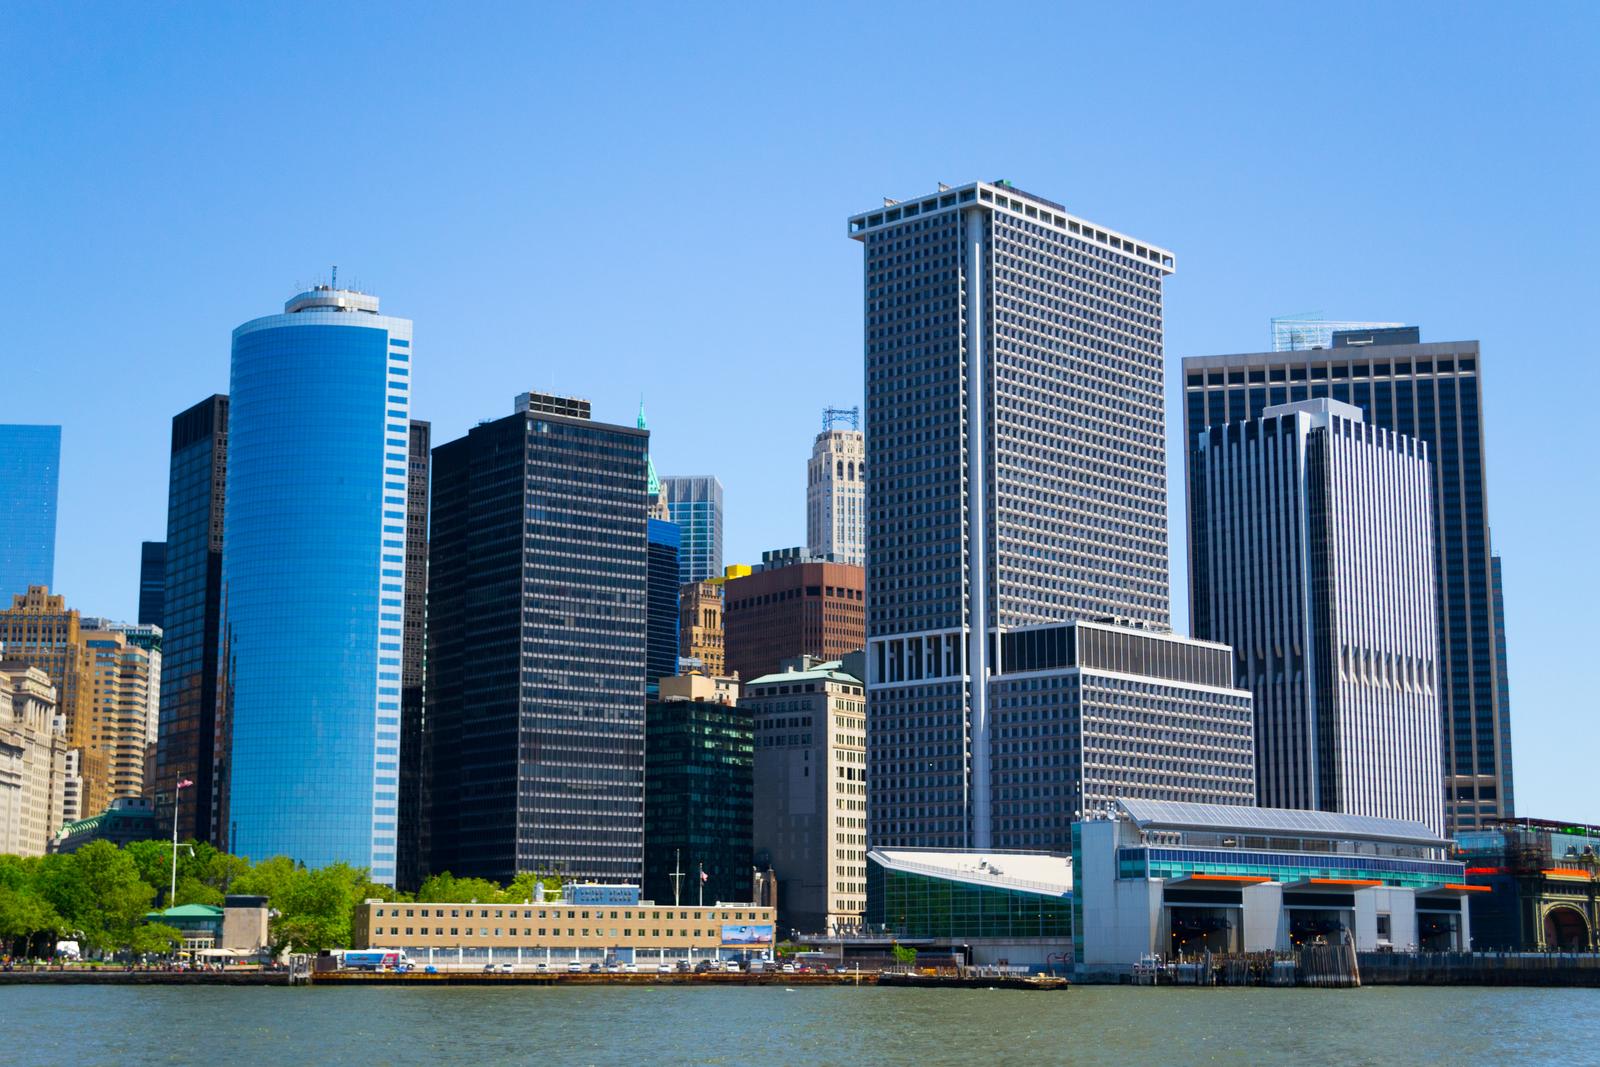 Pleasant Plains Staten Island, NY Private Investigator